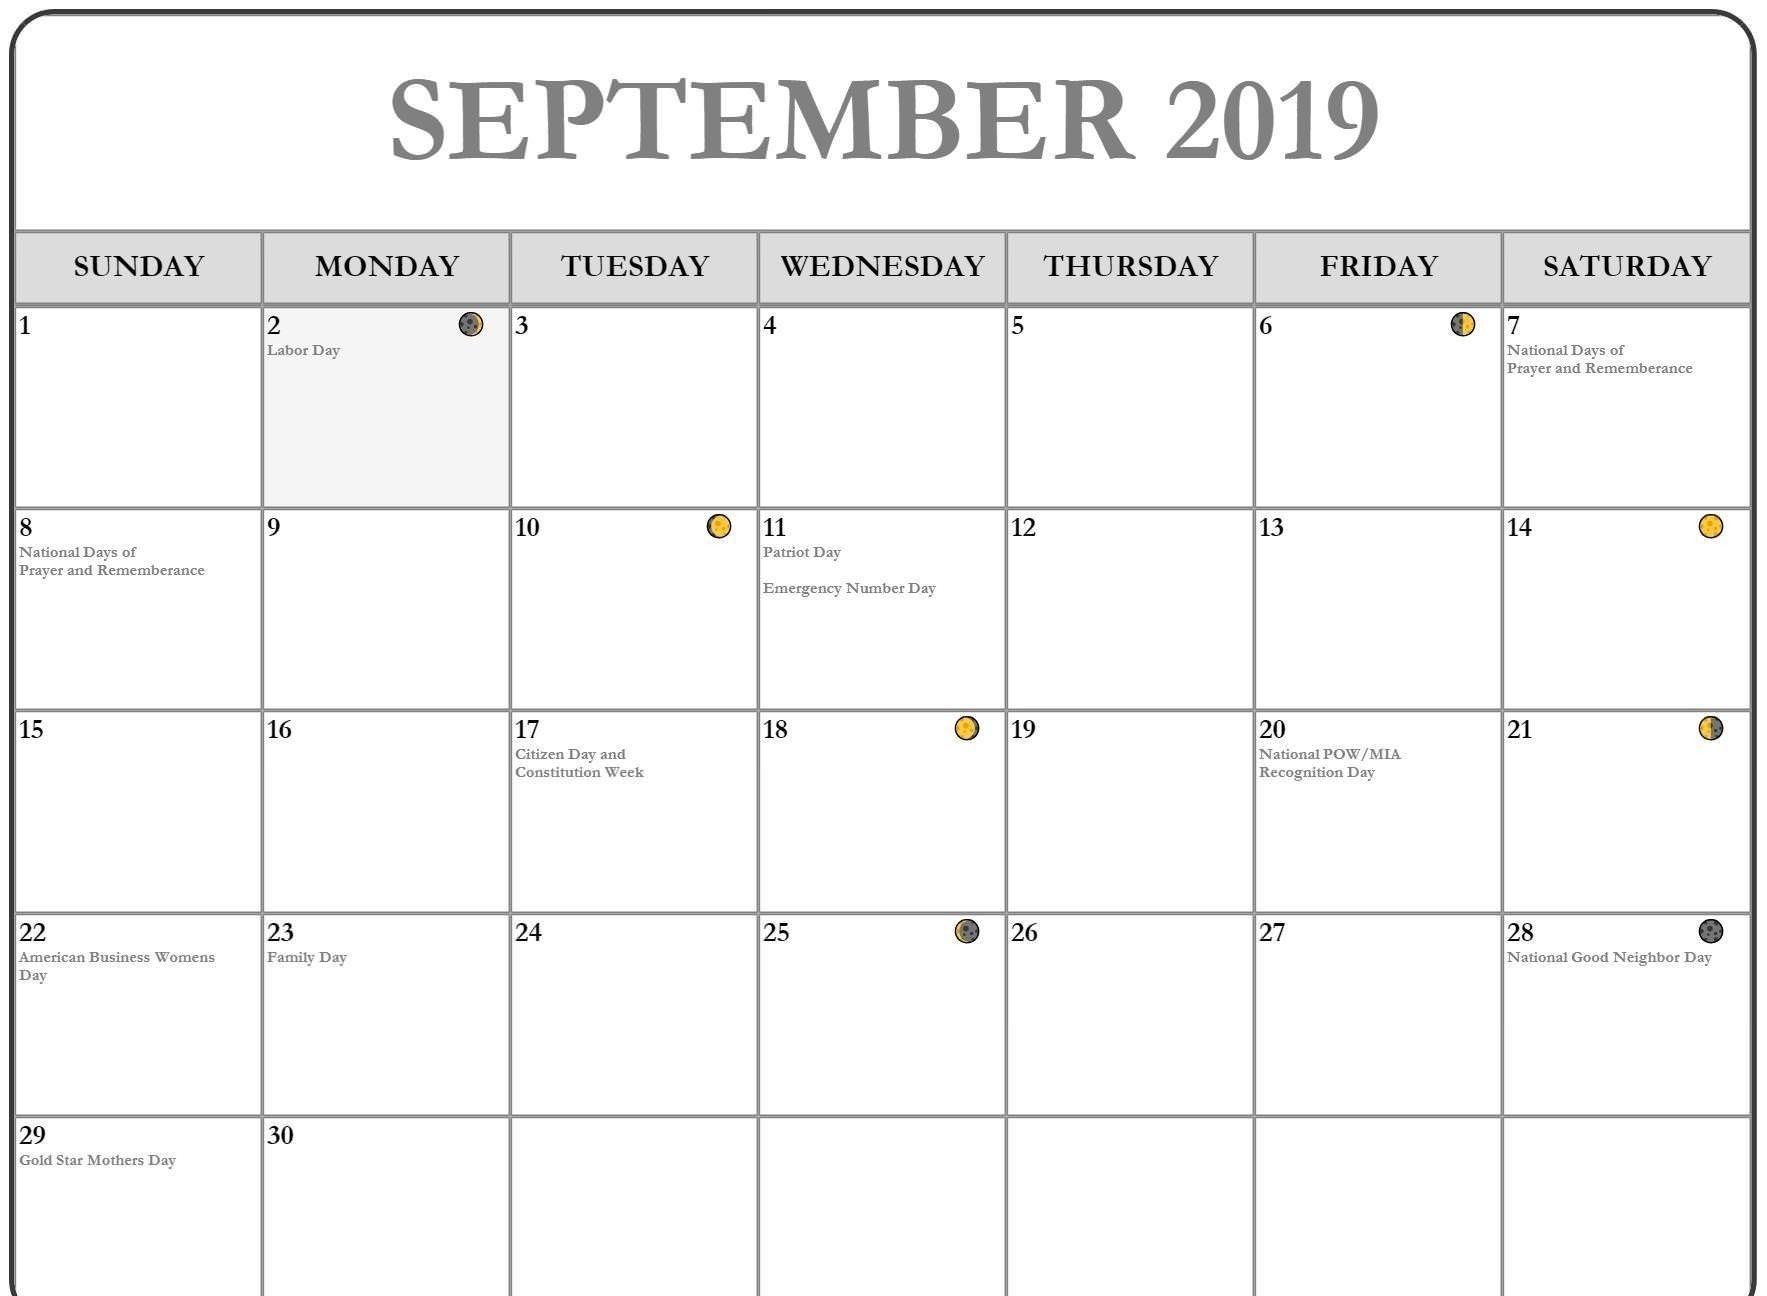 2019 September Moon Phases Calendar | Moon Phase Calendar